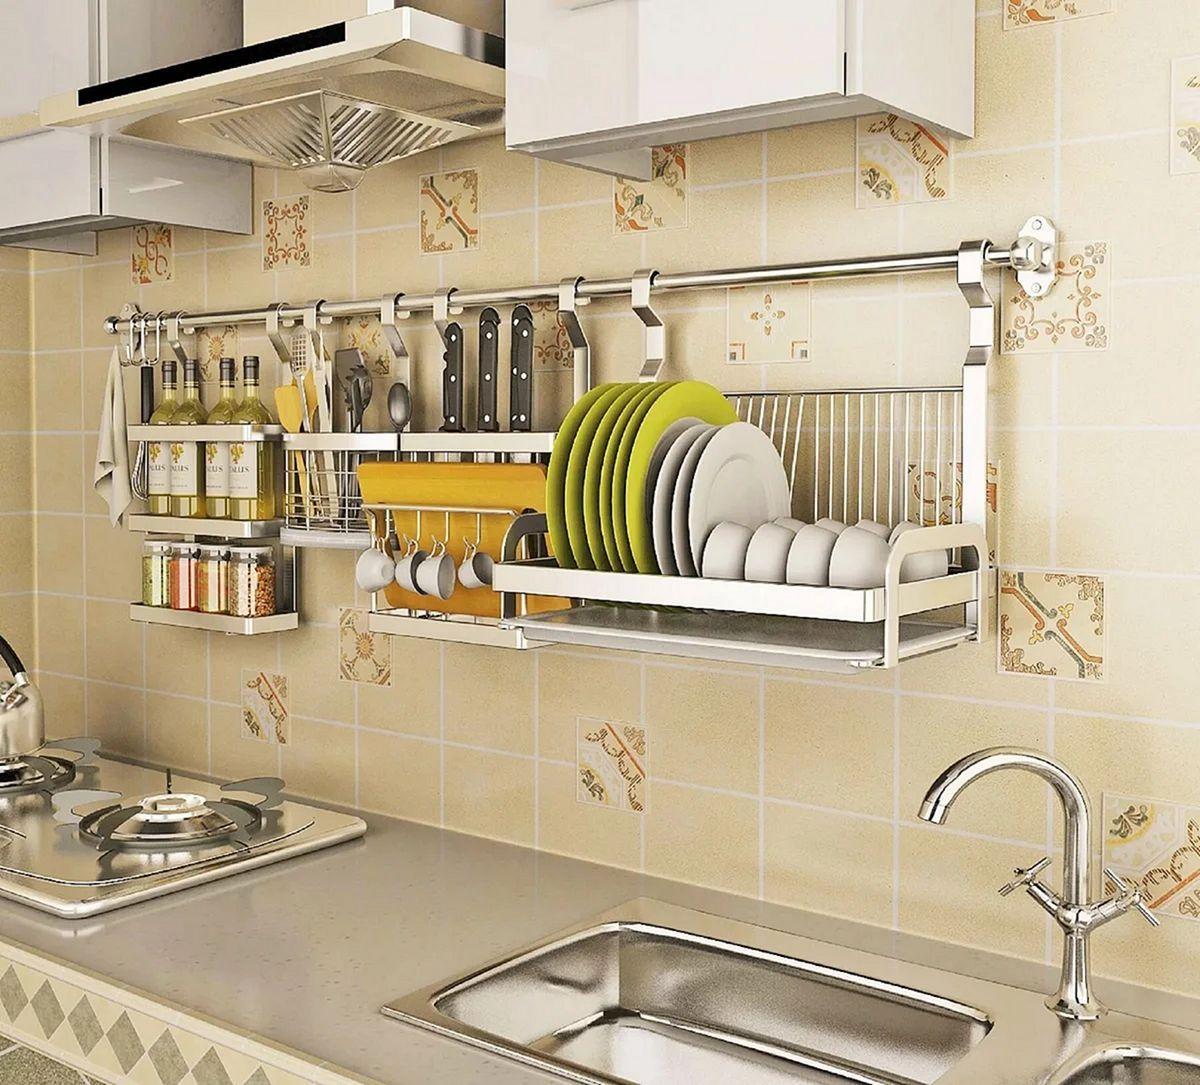 10 Wonderful Stainless Kitchen Rack